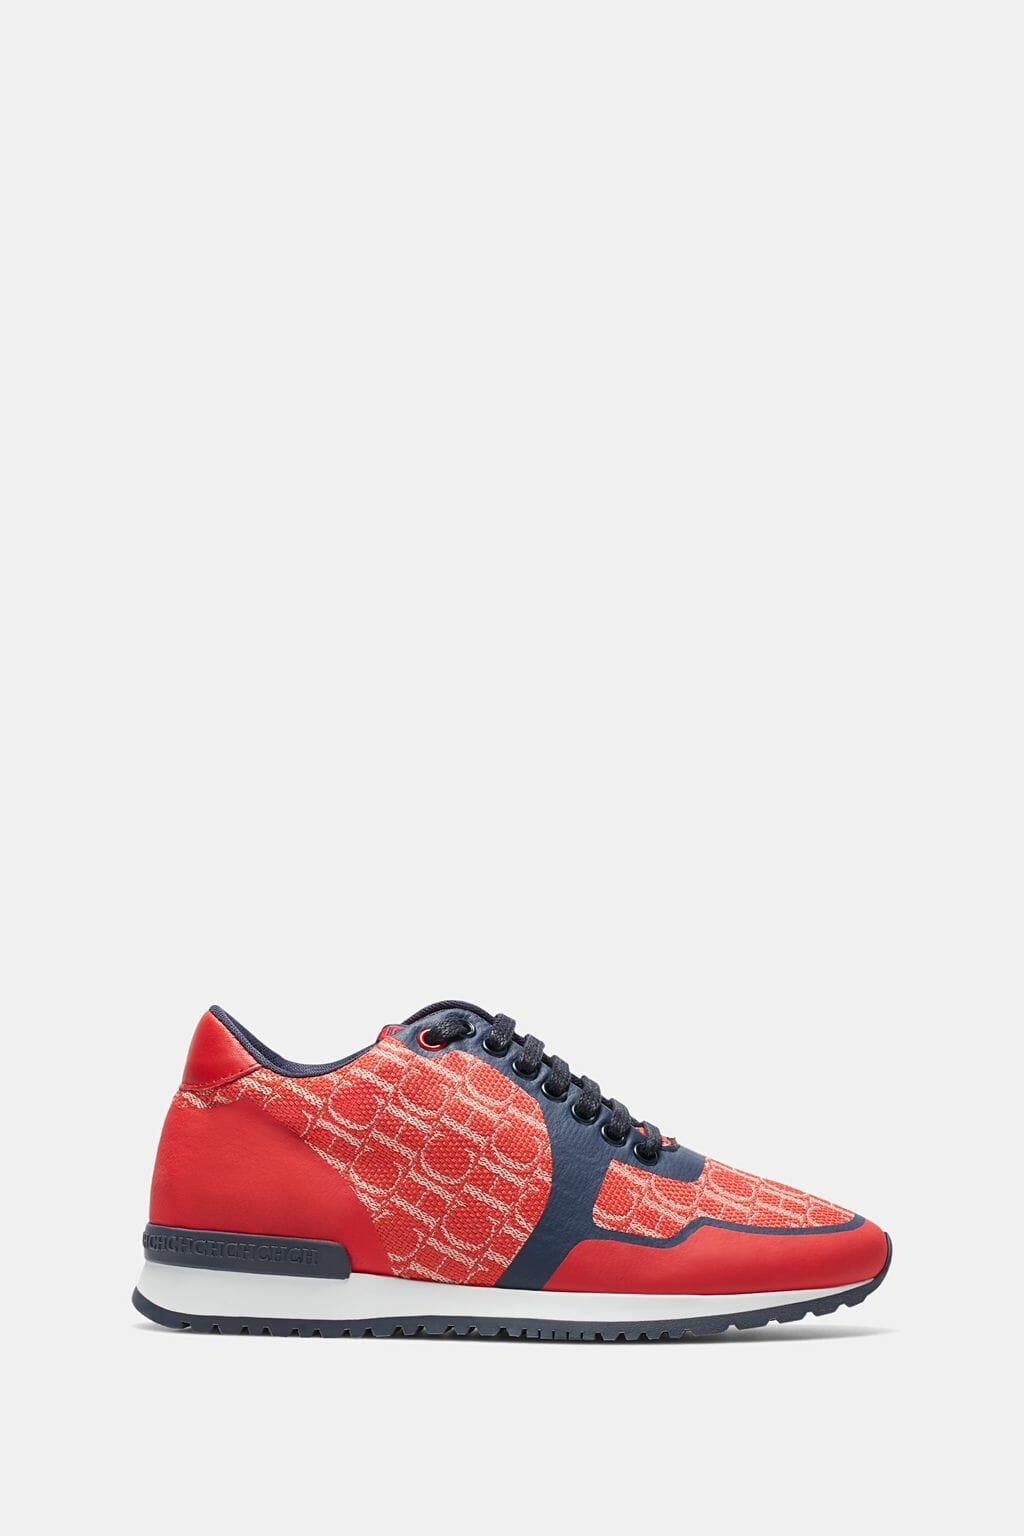 CH-Carolina-herrera-shoes-collection-Spring-Summer-2018-shoe-62